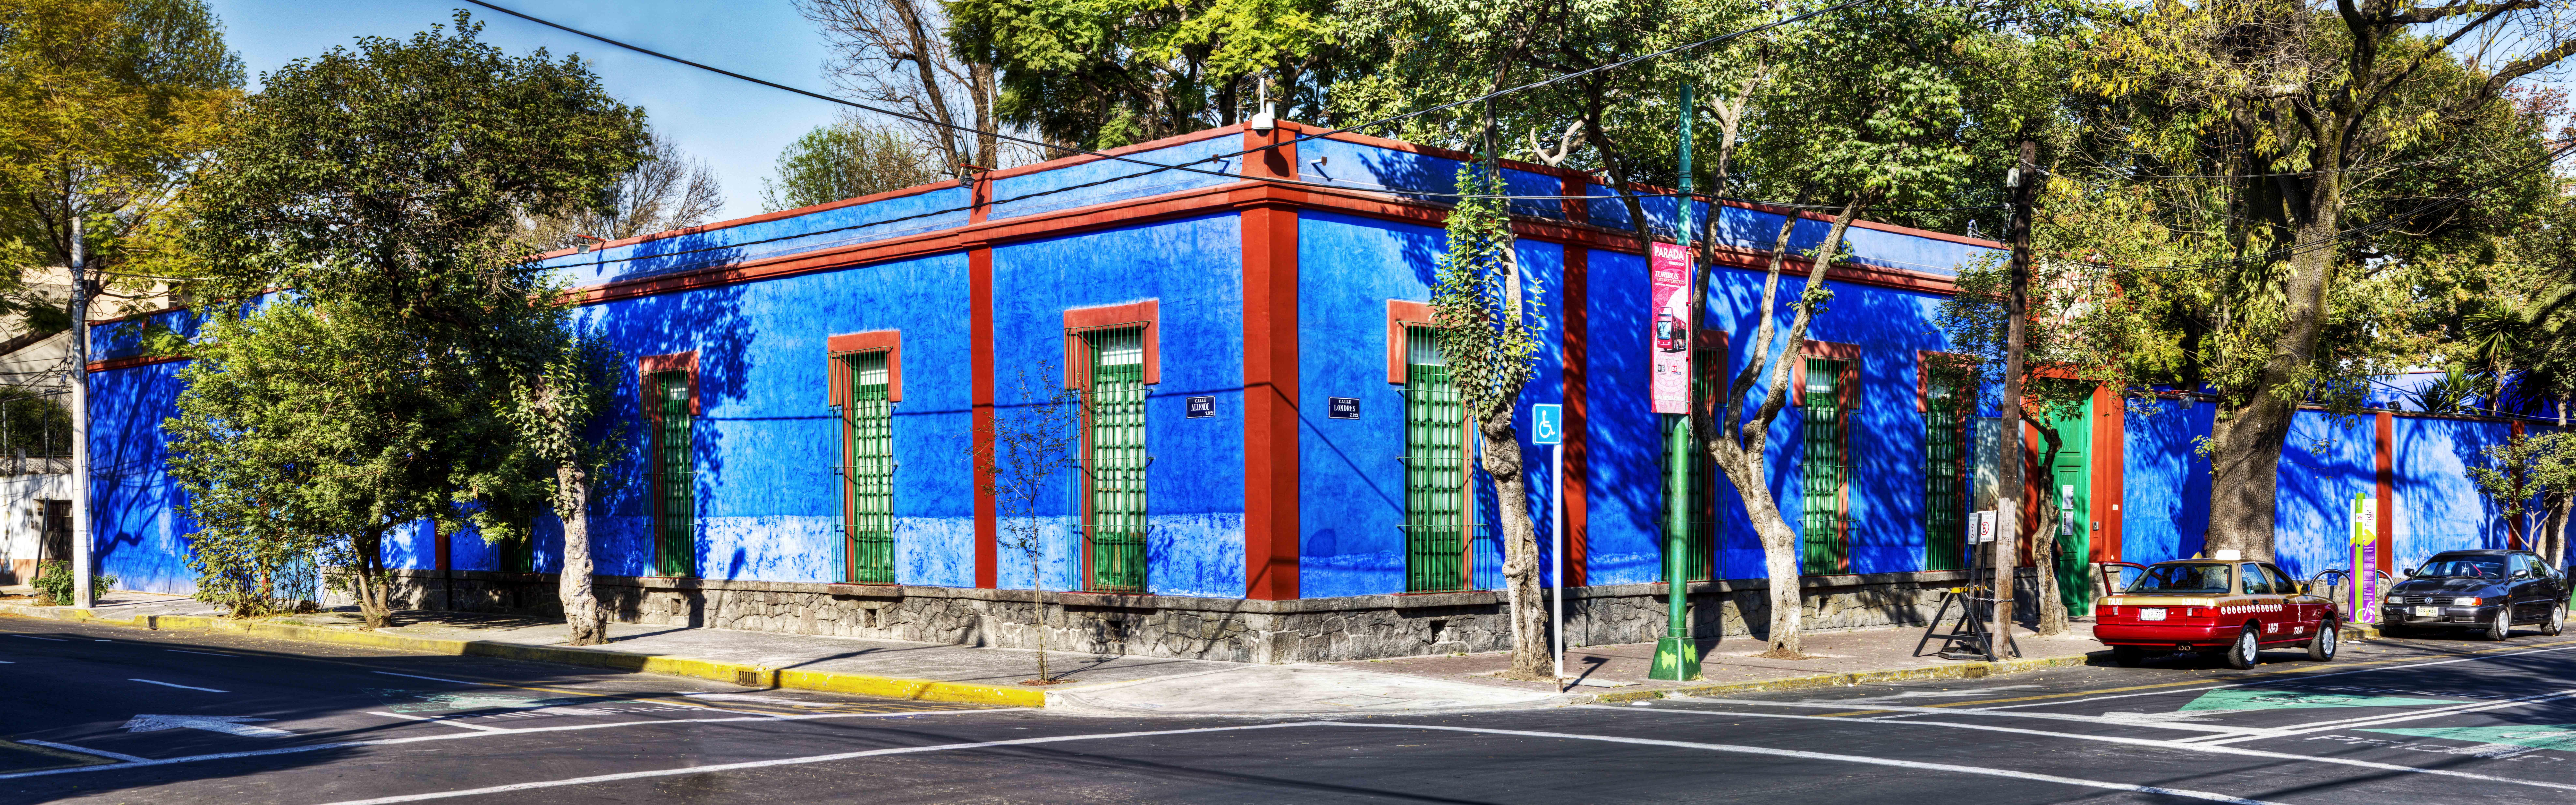 Frida's Casa Azul